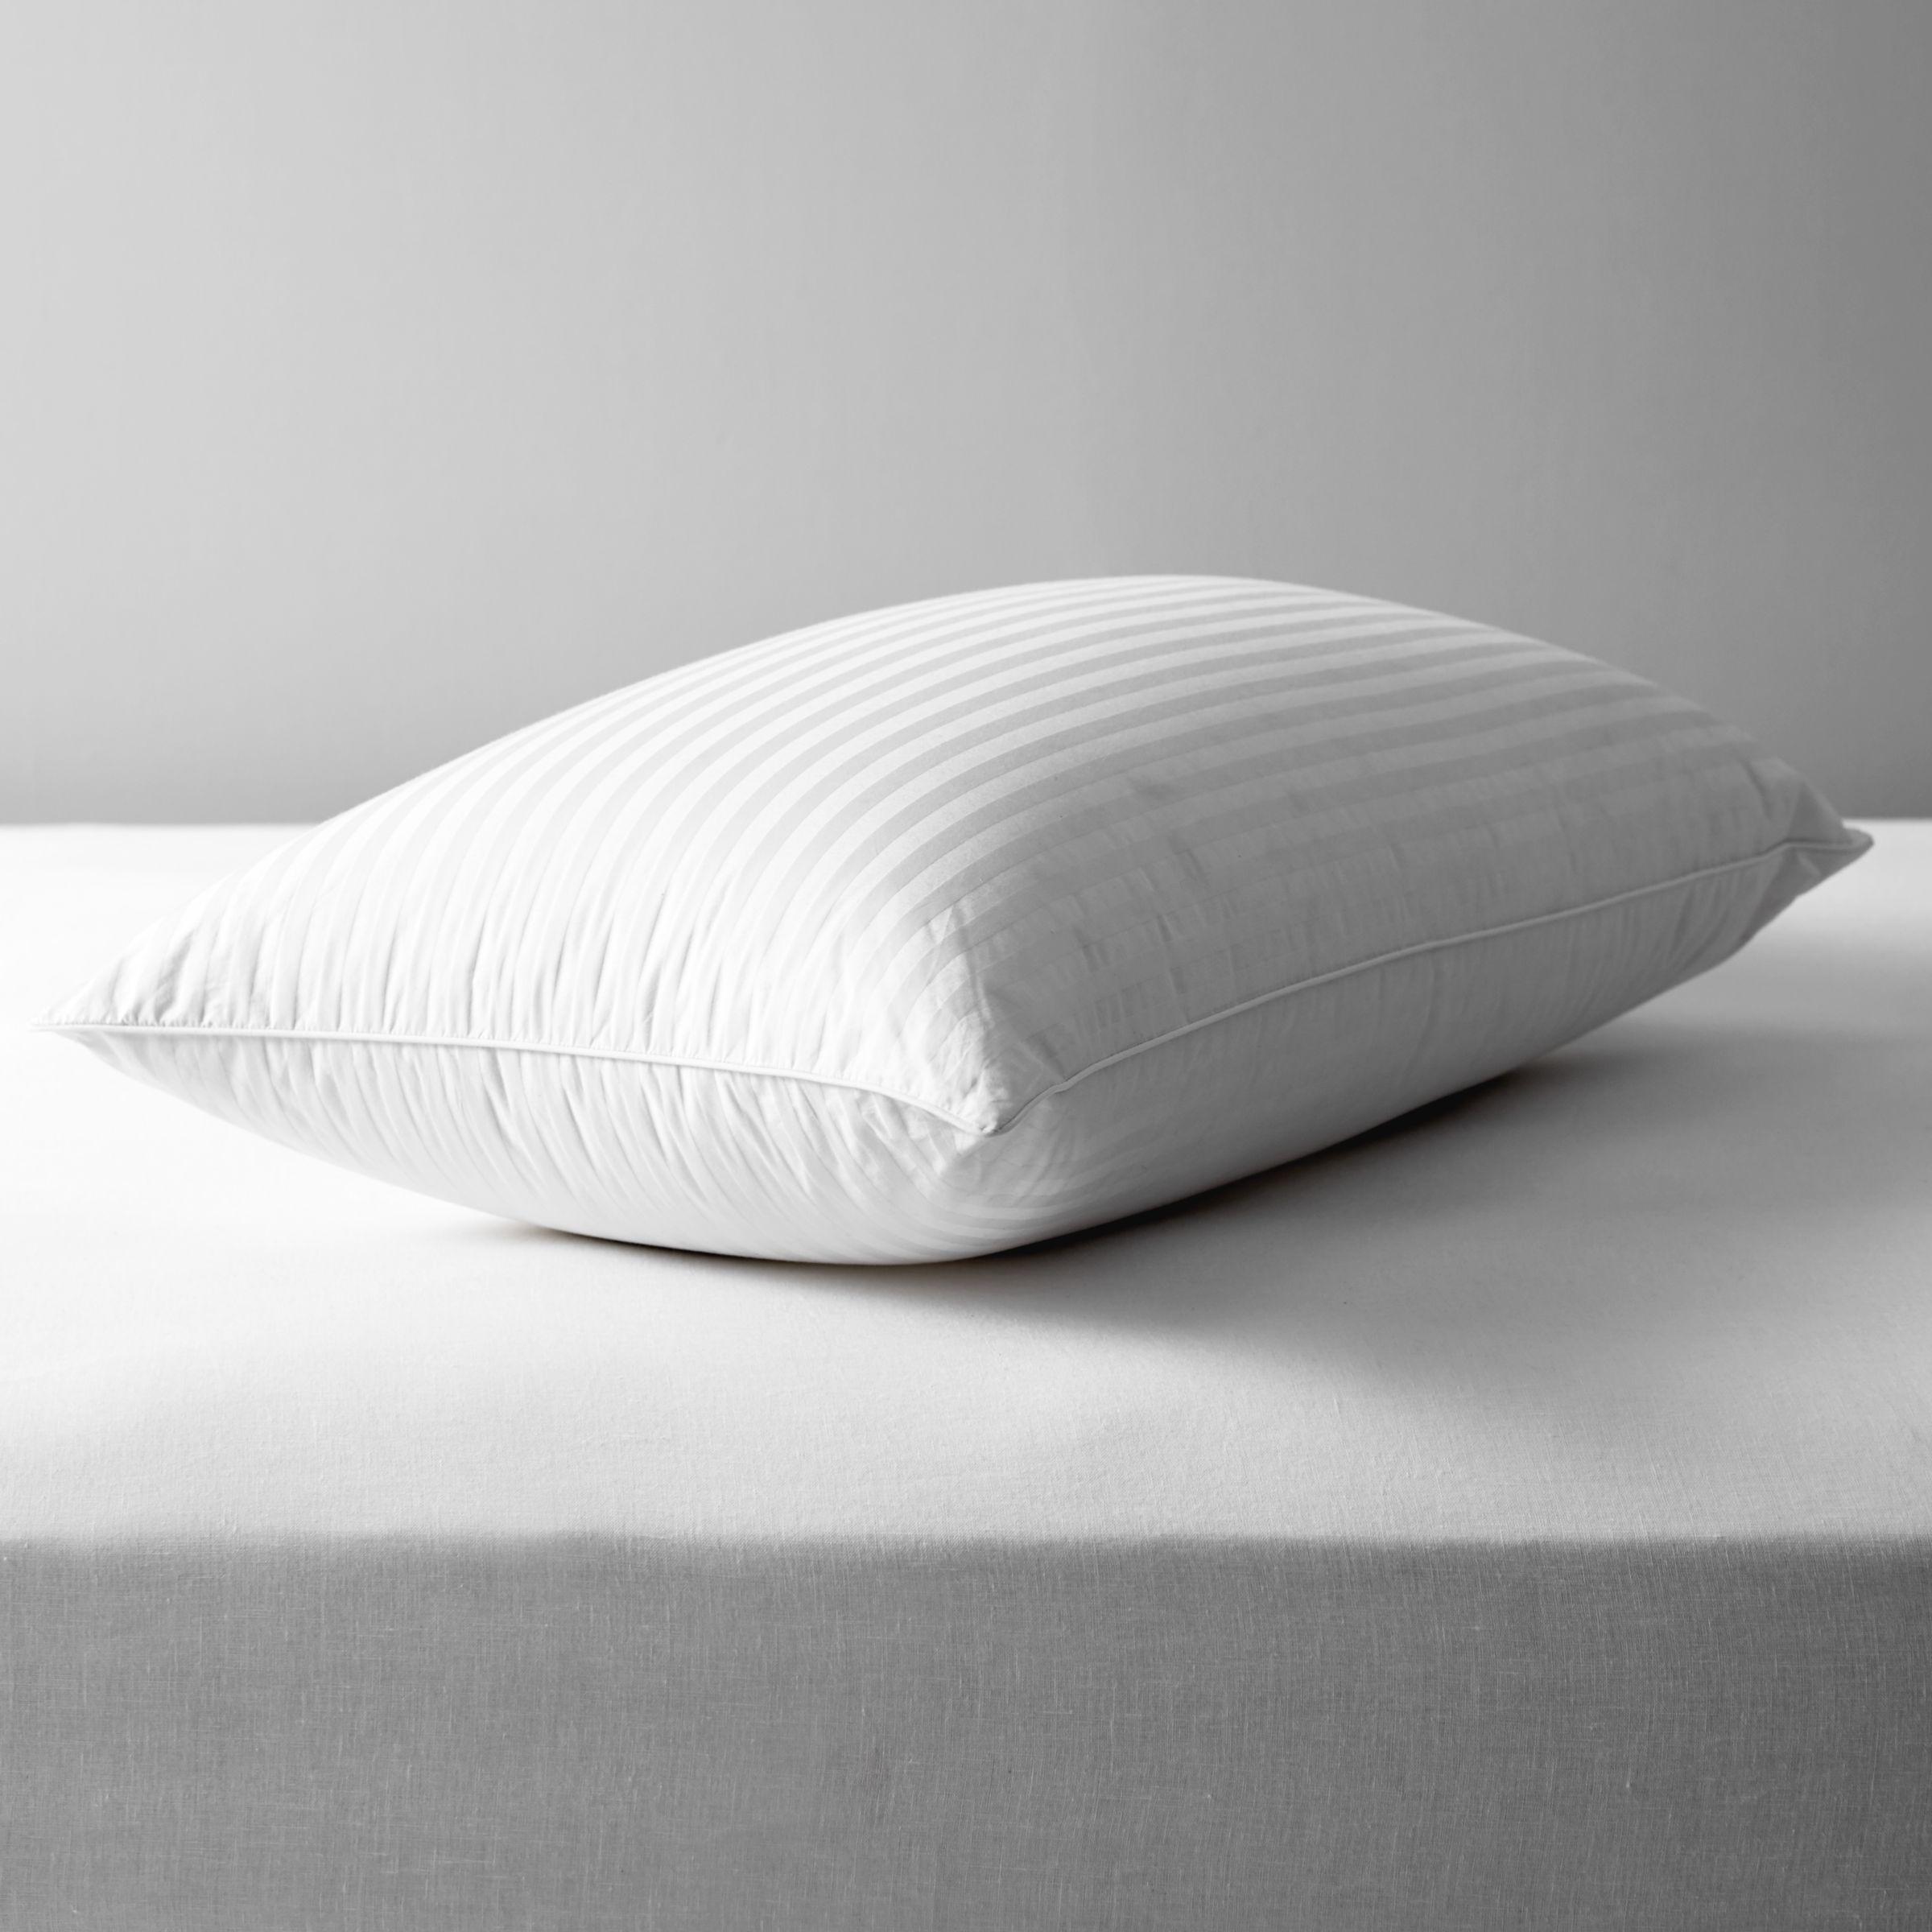 John Lewis & Partners Natural Collection Hungarian Goose Down Standard Pillow, Firm